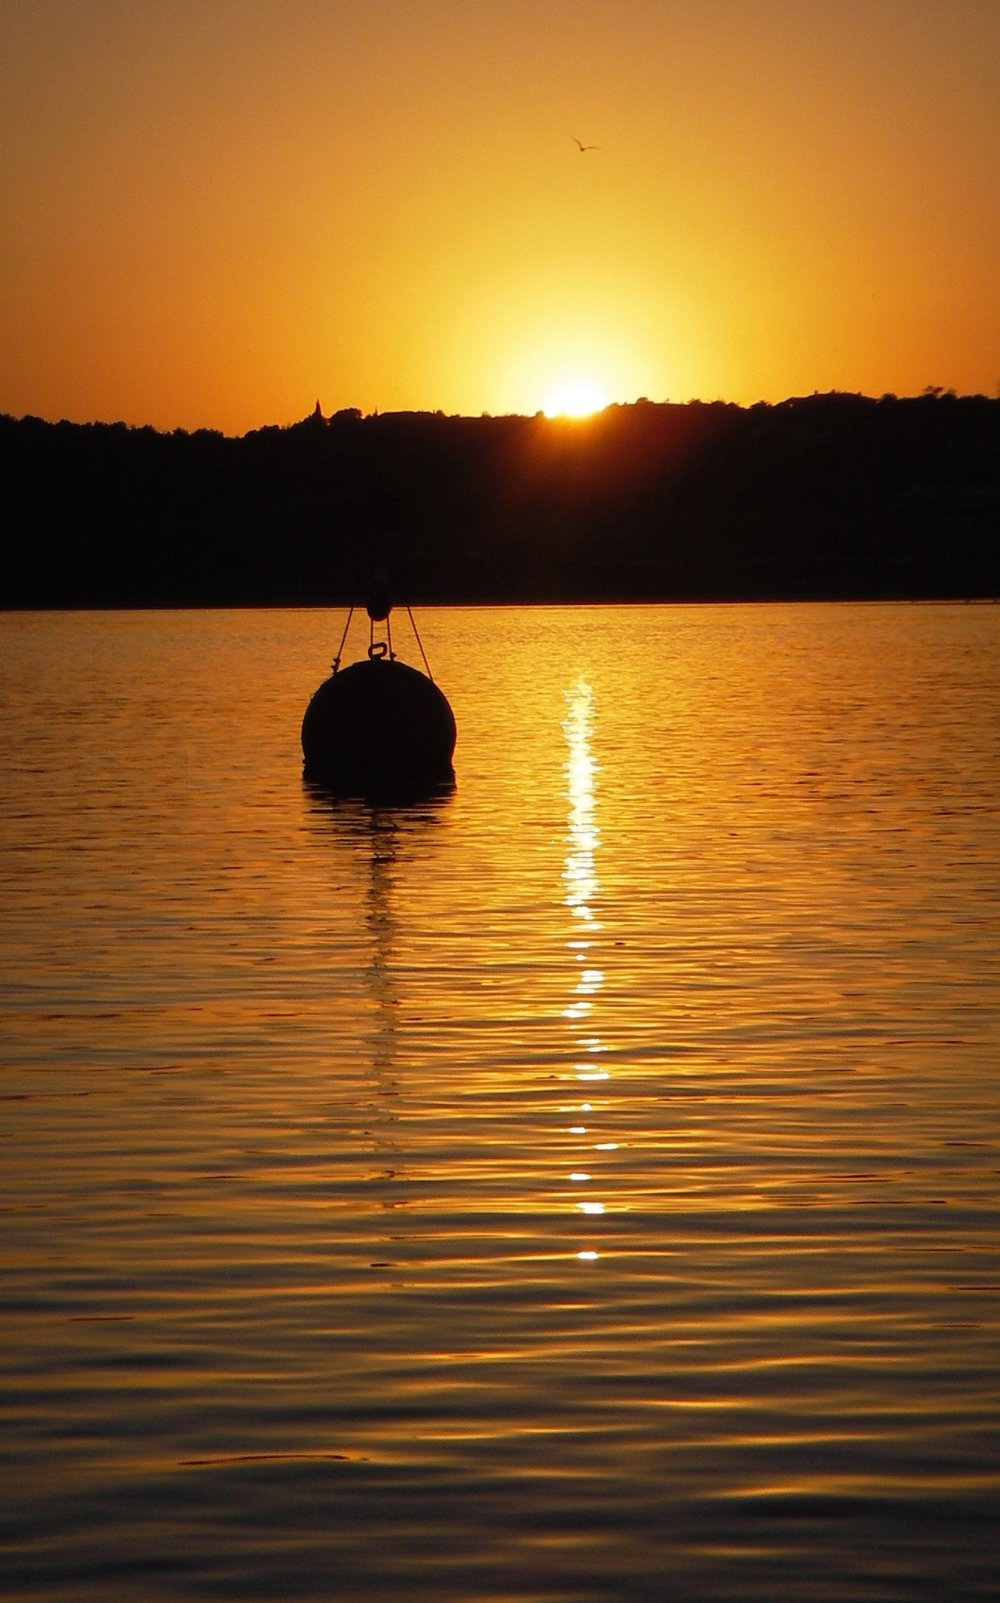 sunsetbuoy.jpg